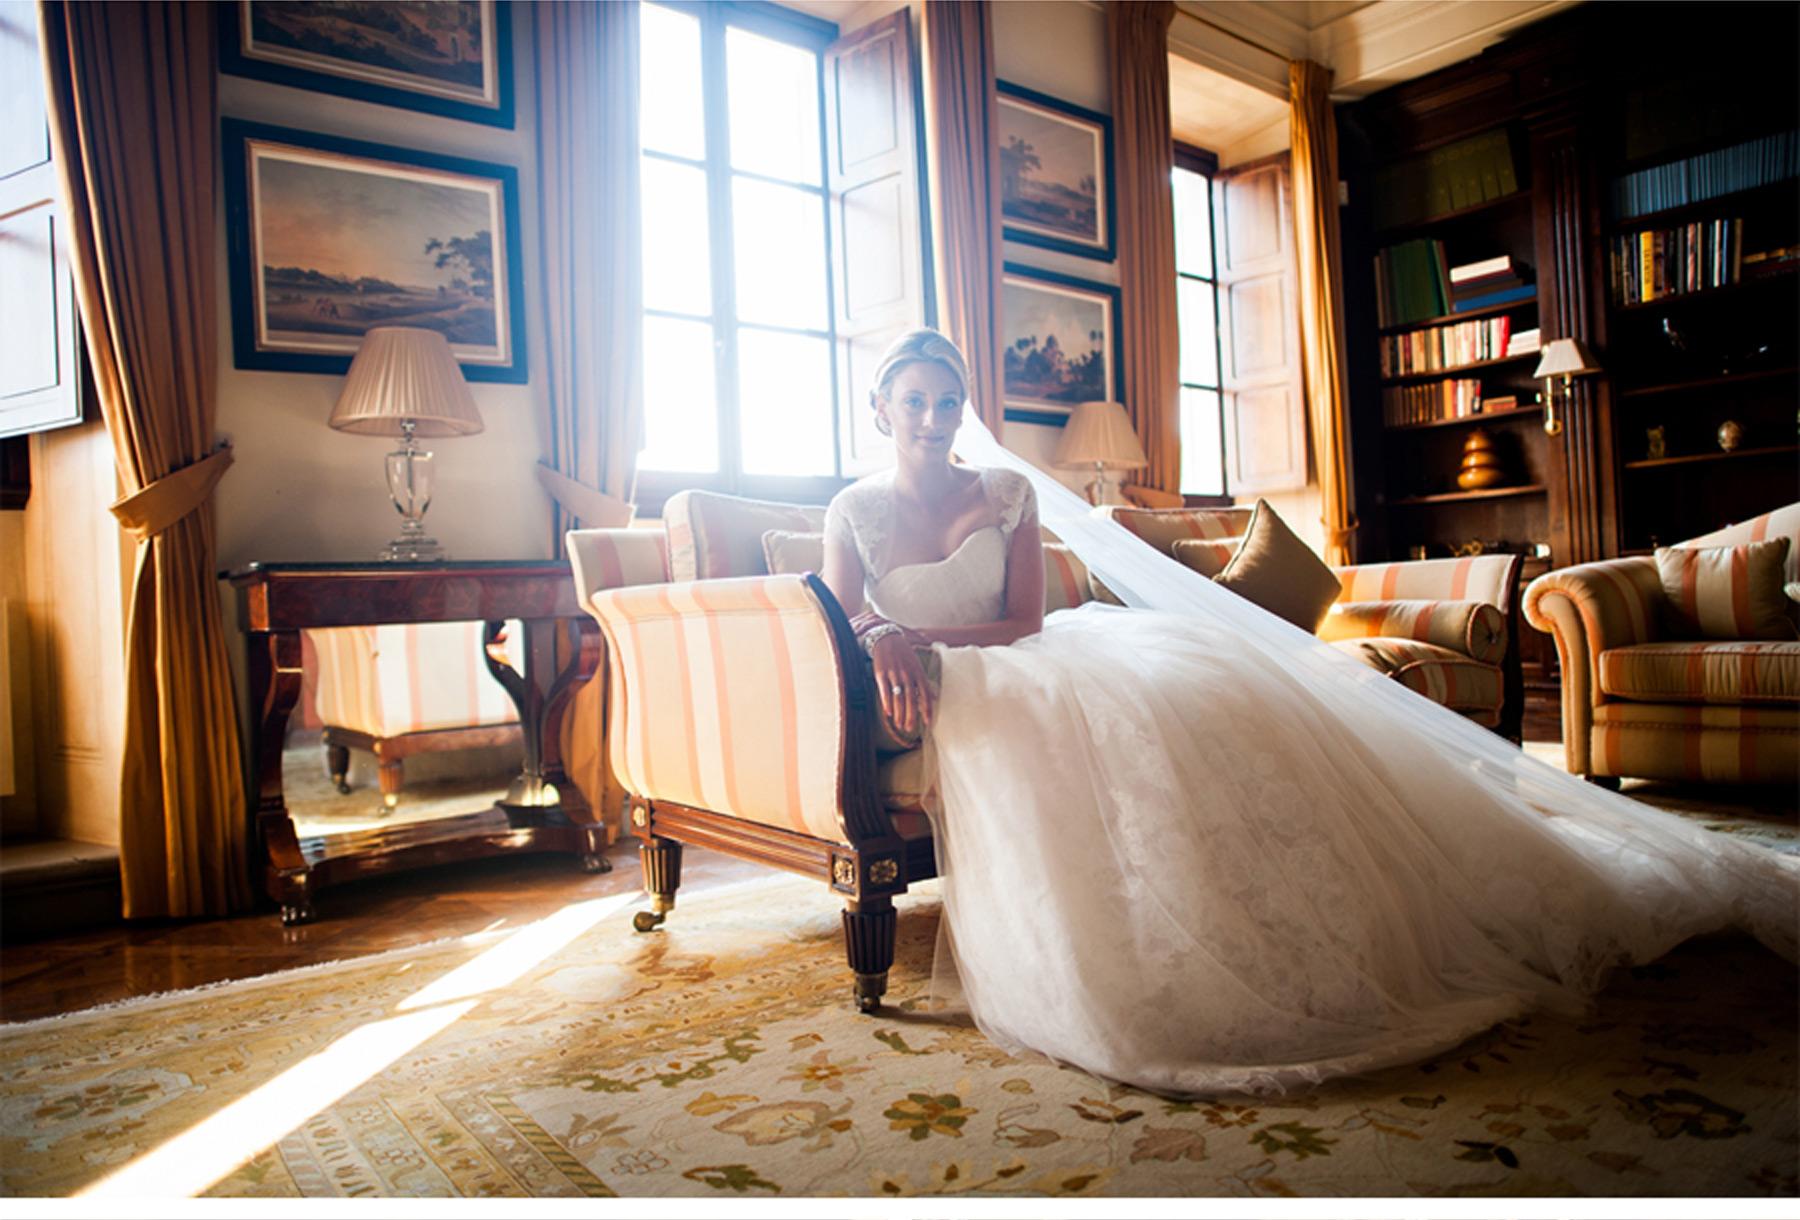 Our Muse - Italian Countryside Wedding - Be inspired by Meghan & Steven's Italian countryside wedding - wedding, luxury, italy, tuscany, il borro, ecru, garden, green, invitation, venue, inspired, getting ready, bridesmaids, bride, groom